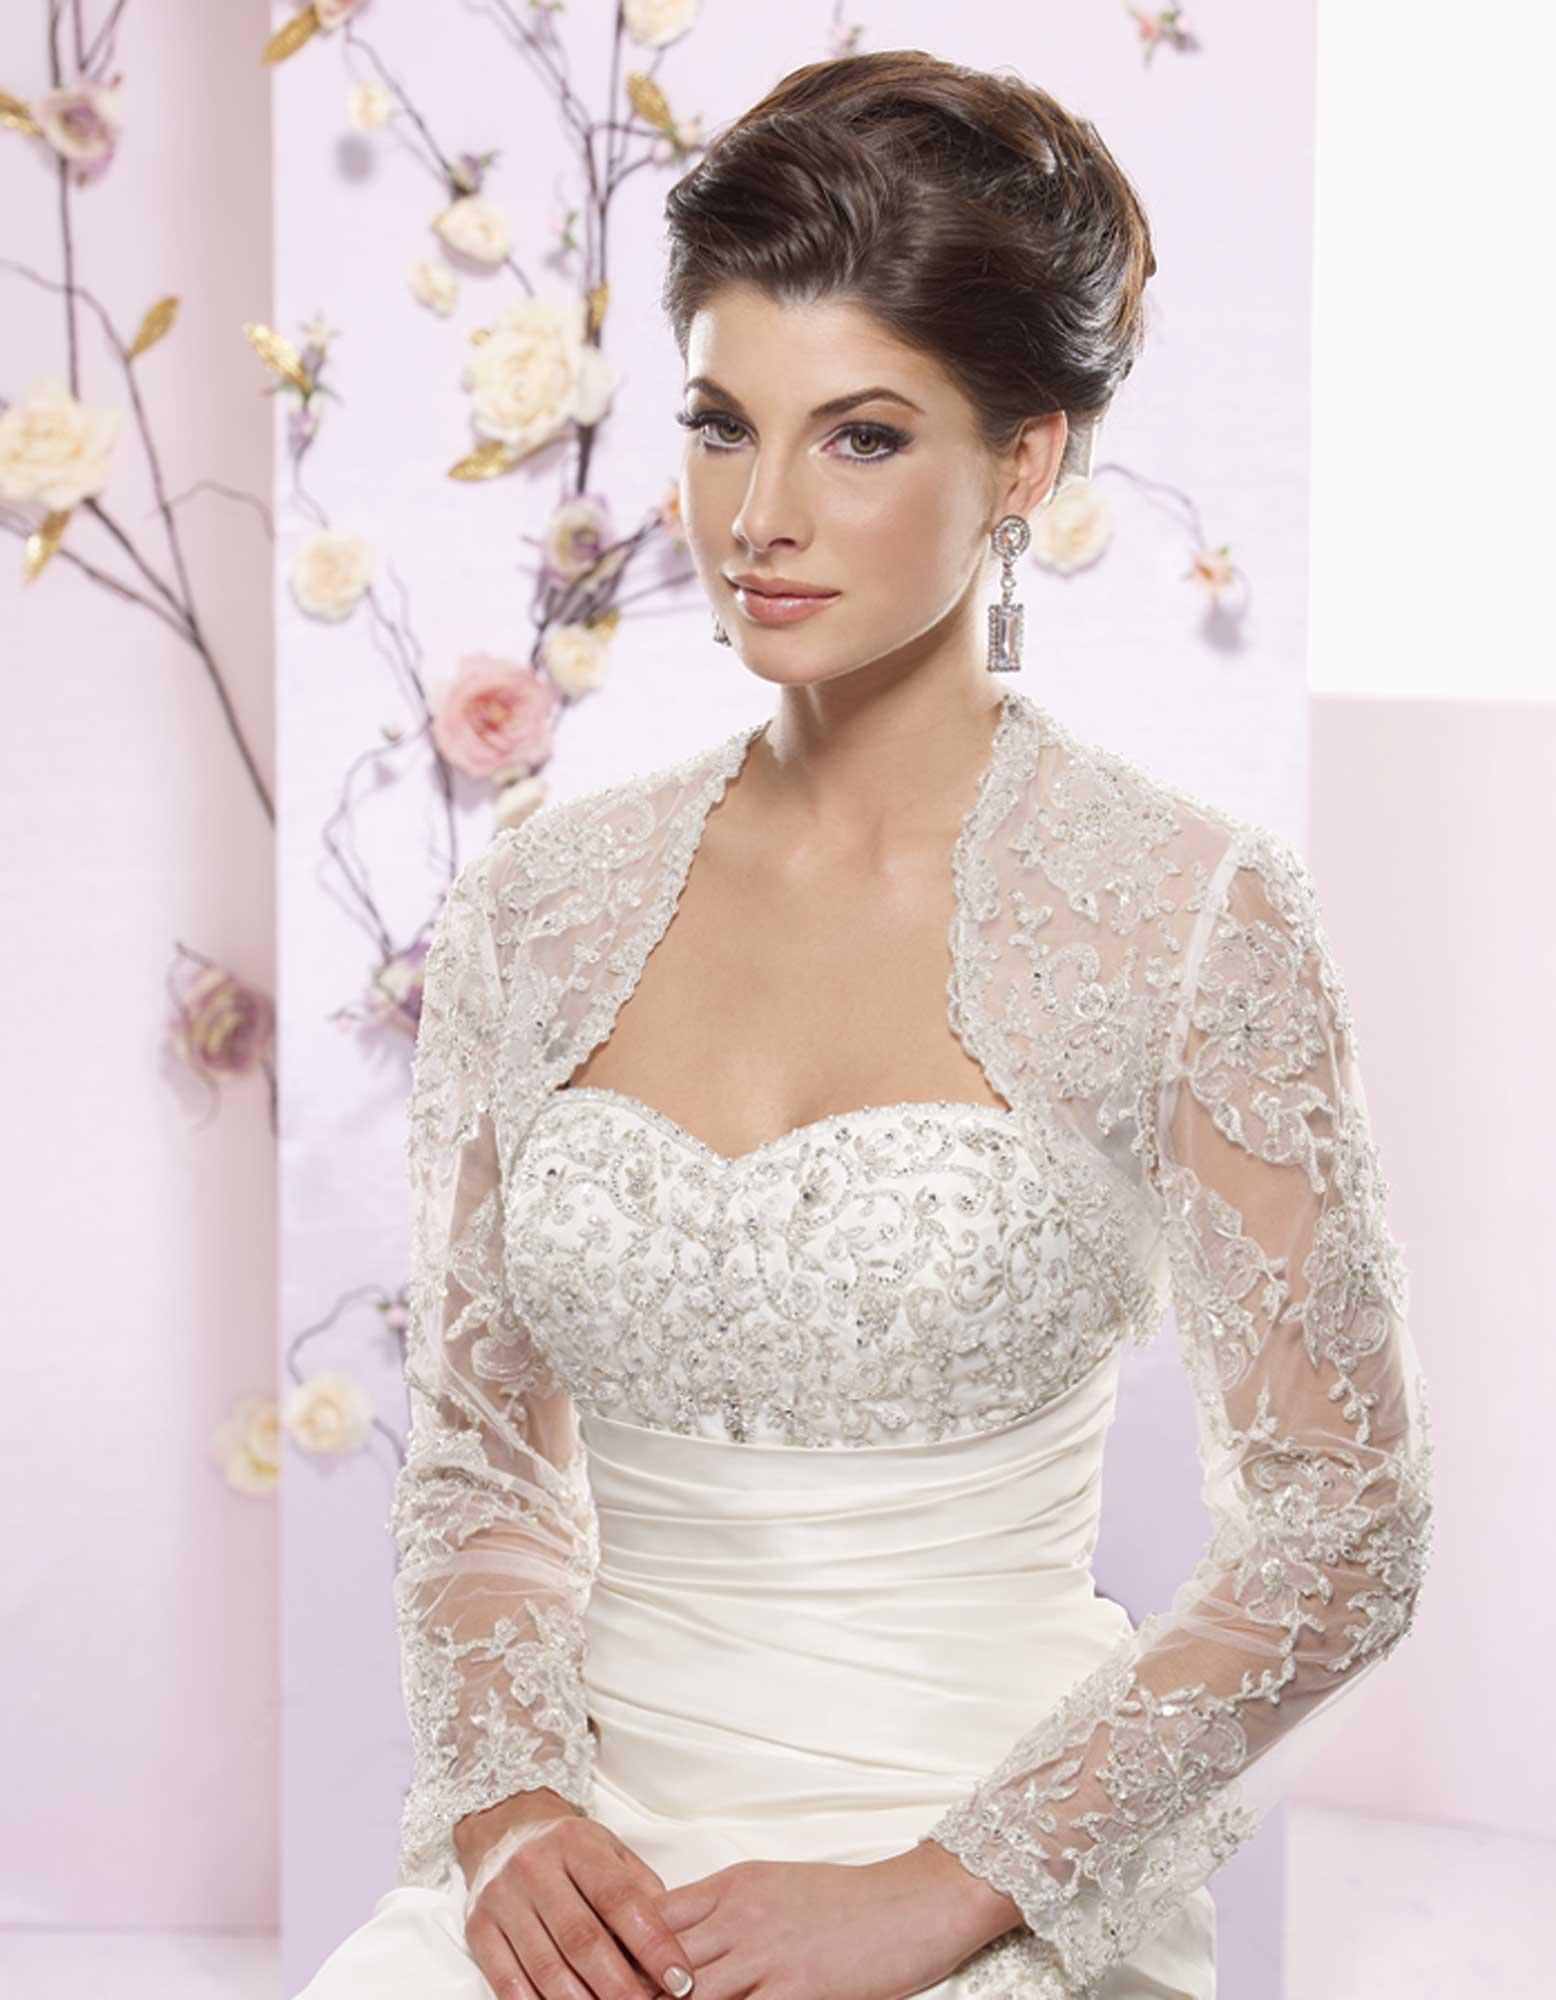 brides dresses,brides dresses,brides dresses